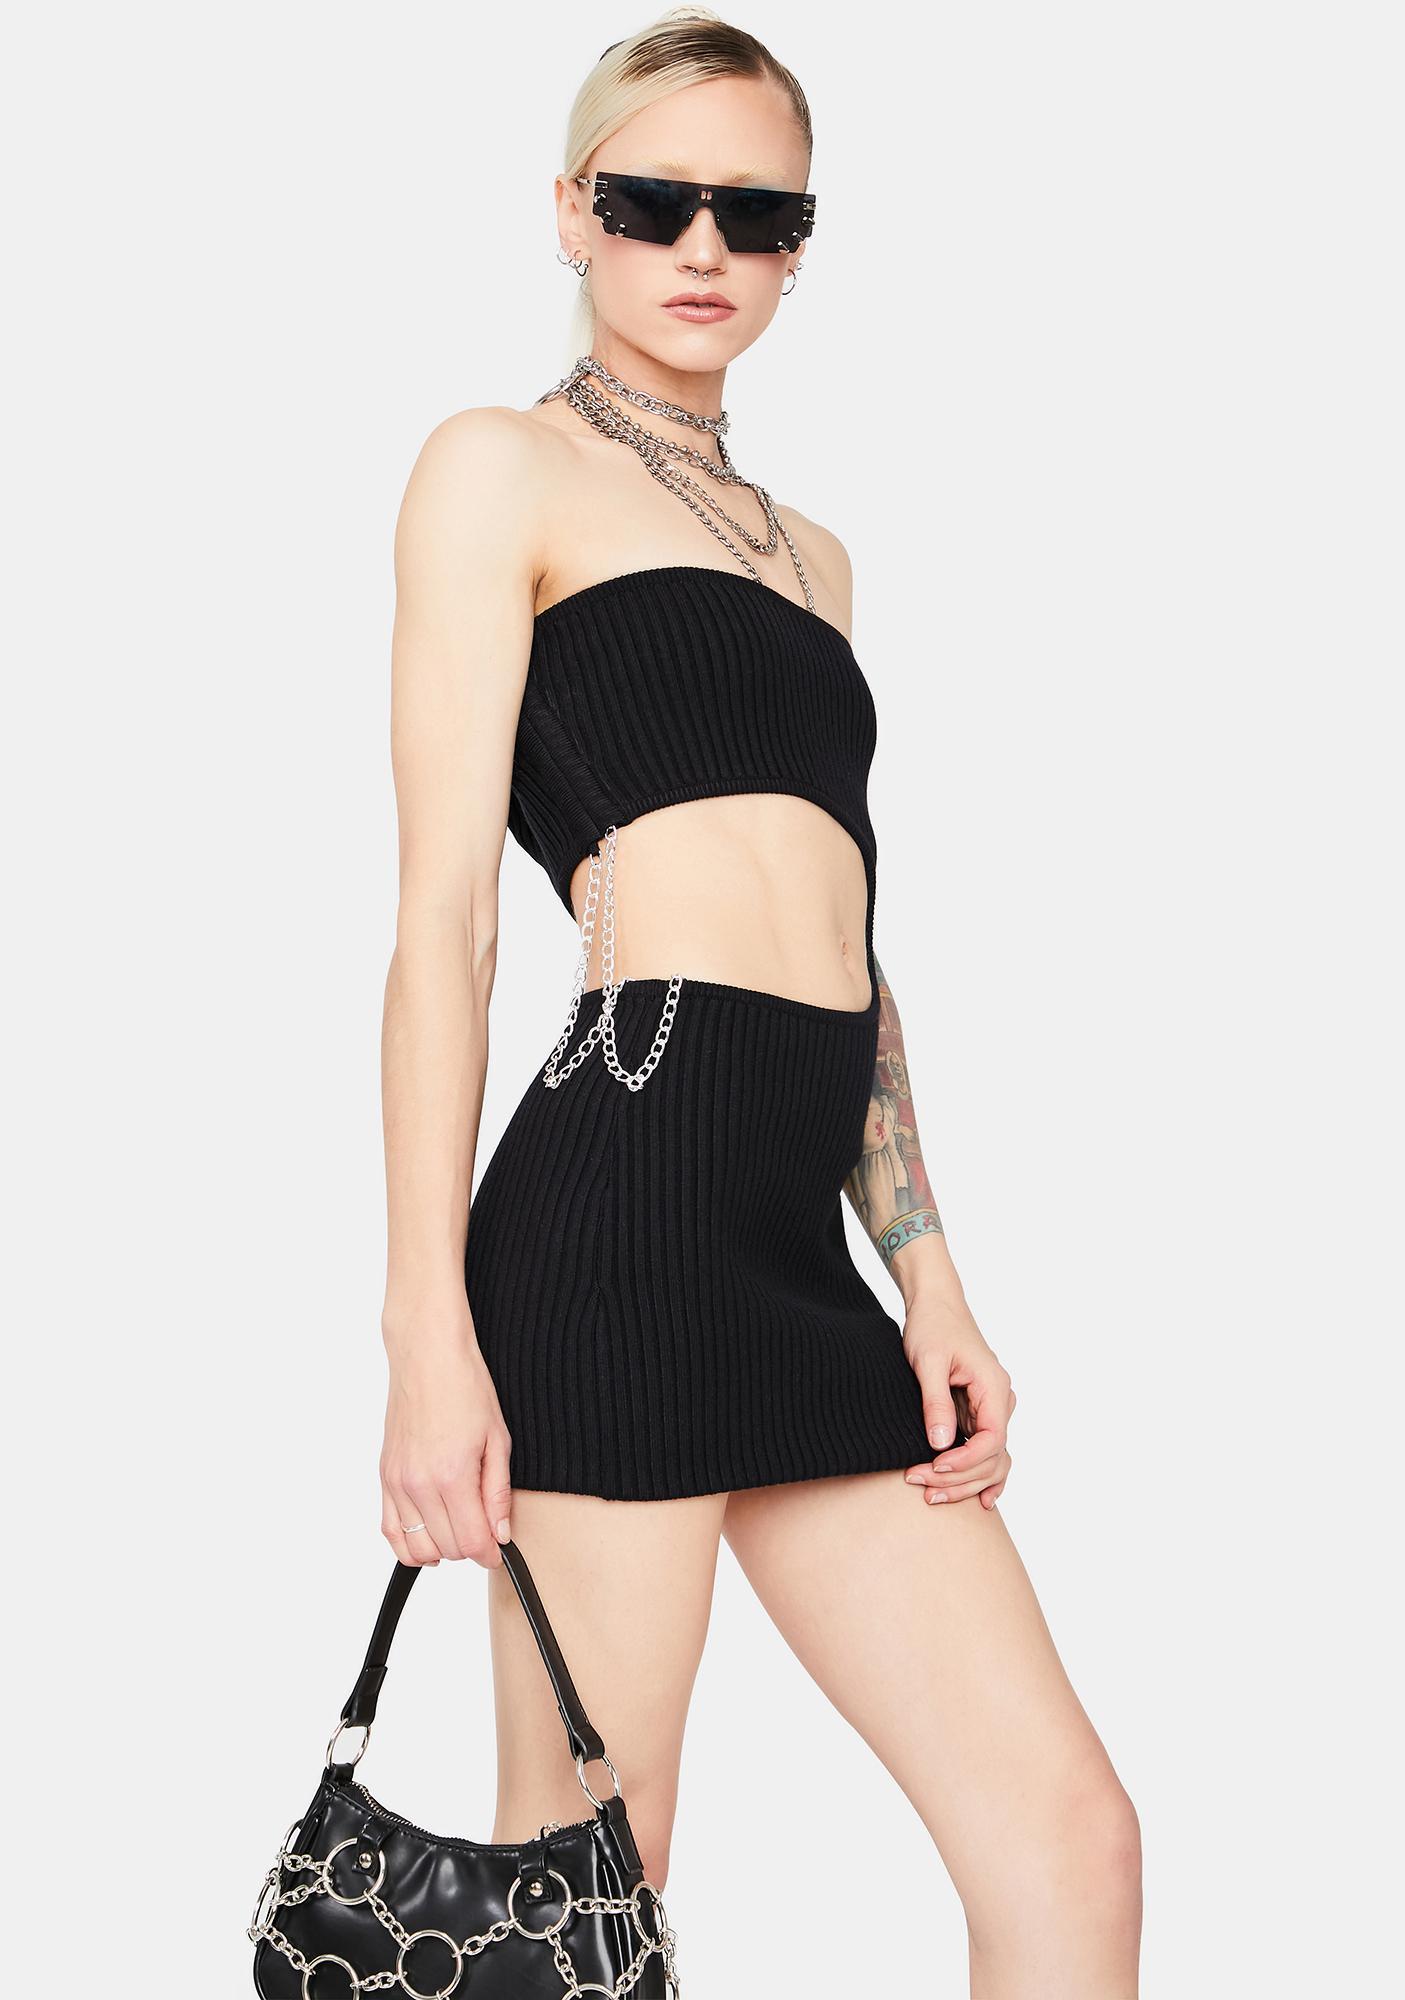 Risky Behavior Cutout Tube Dress